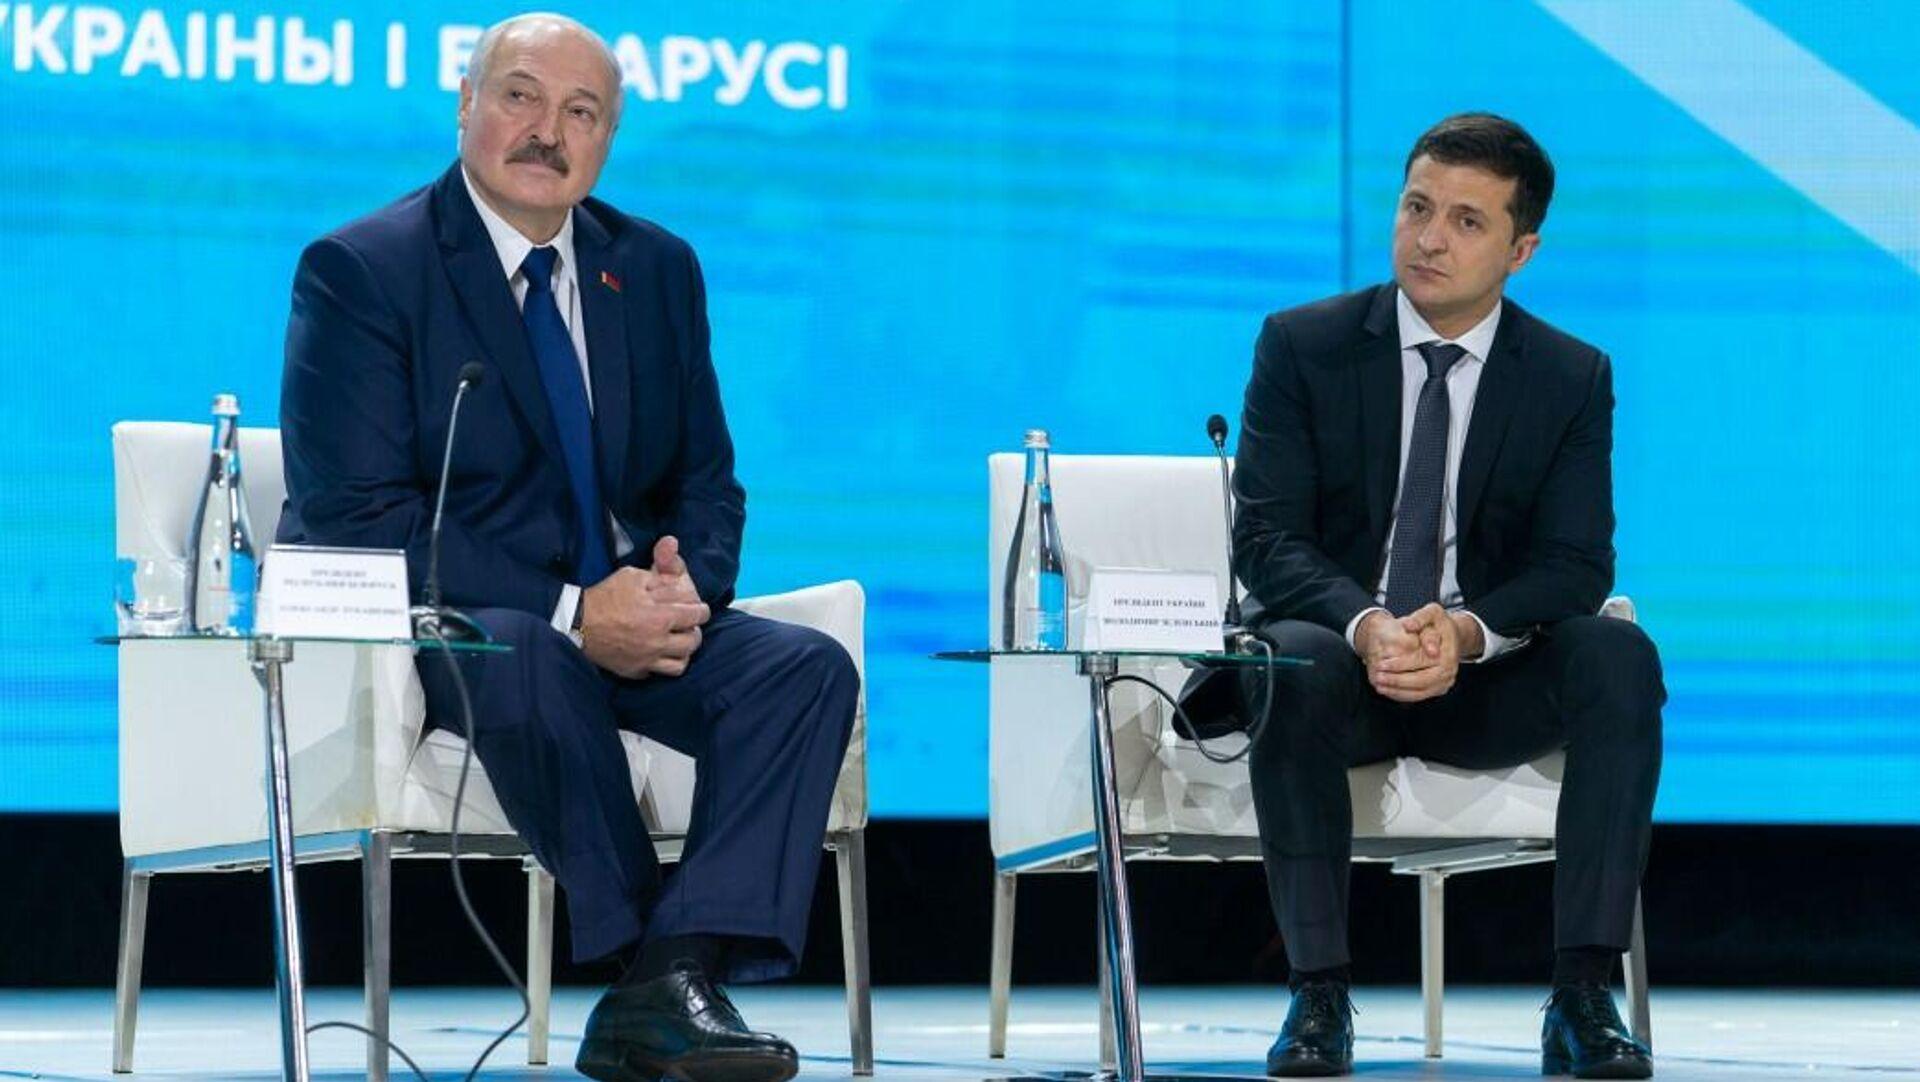 Президент Беларуси Александр Лукашенко и президент Украины Владимир Зеленский  - Sputnik Узбекистан, 1920, 30.07.2021